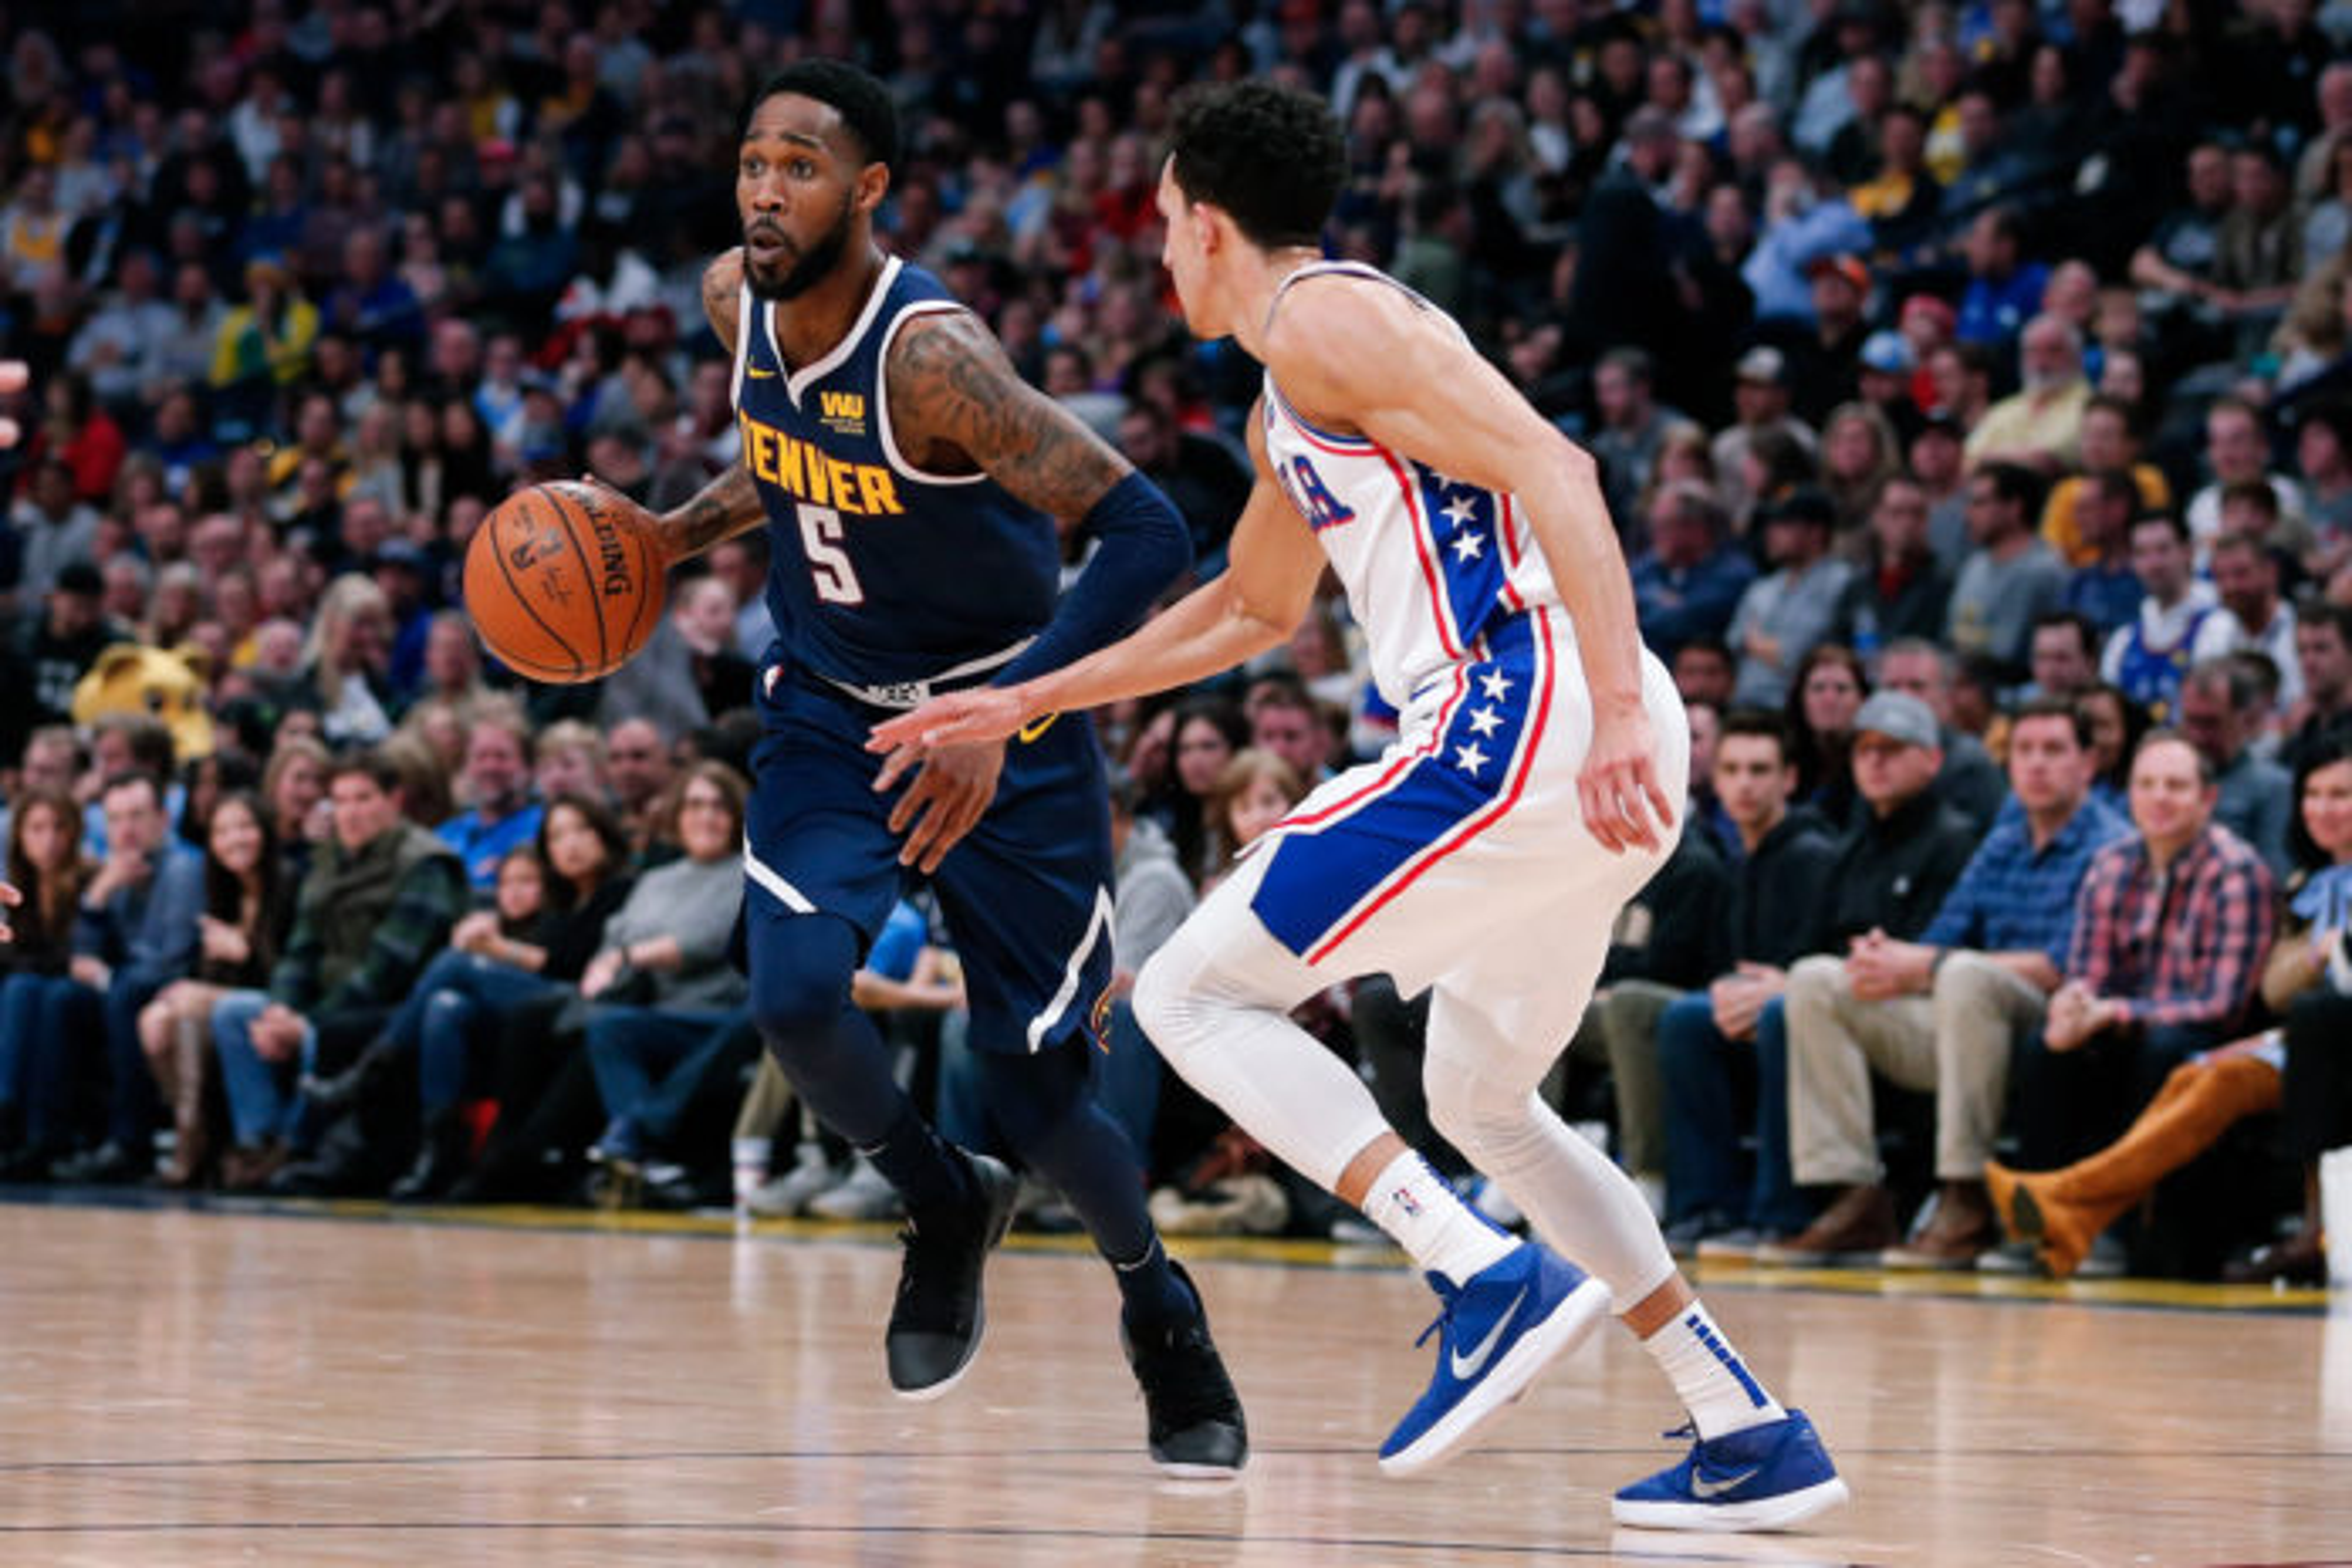 Denver Nuggets guard Will Barton (5) dribbles the ball against Philadelphia 76ers guard Landry Shamet (1) in the second quarter at the Pepsi Center.